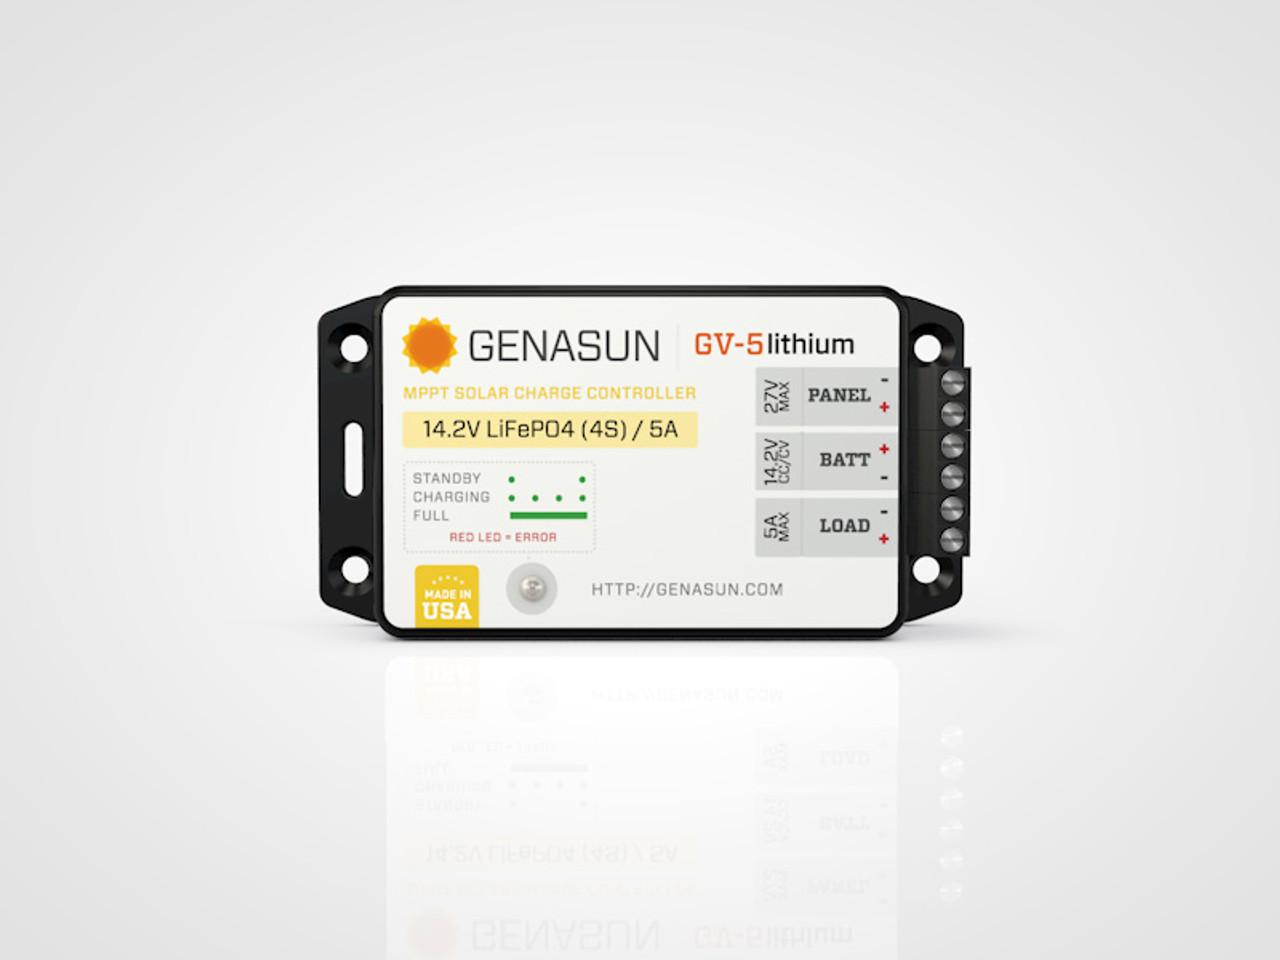 GV-5 | 65W 5A 14.2V Genasun MPPT Solar Charge Controller - Li - Front